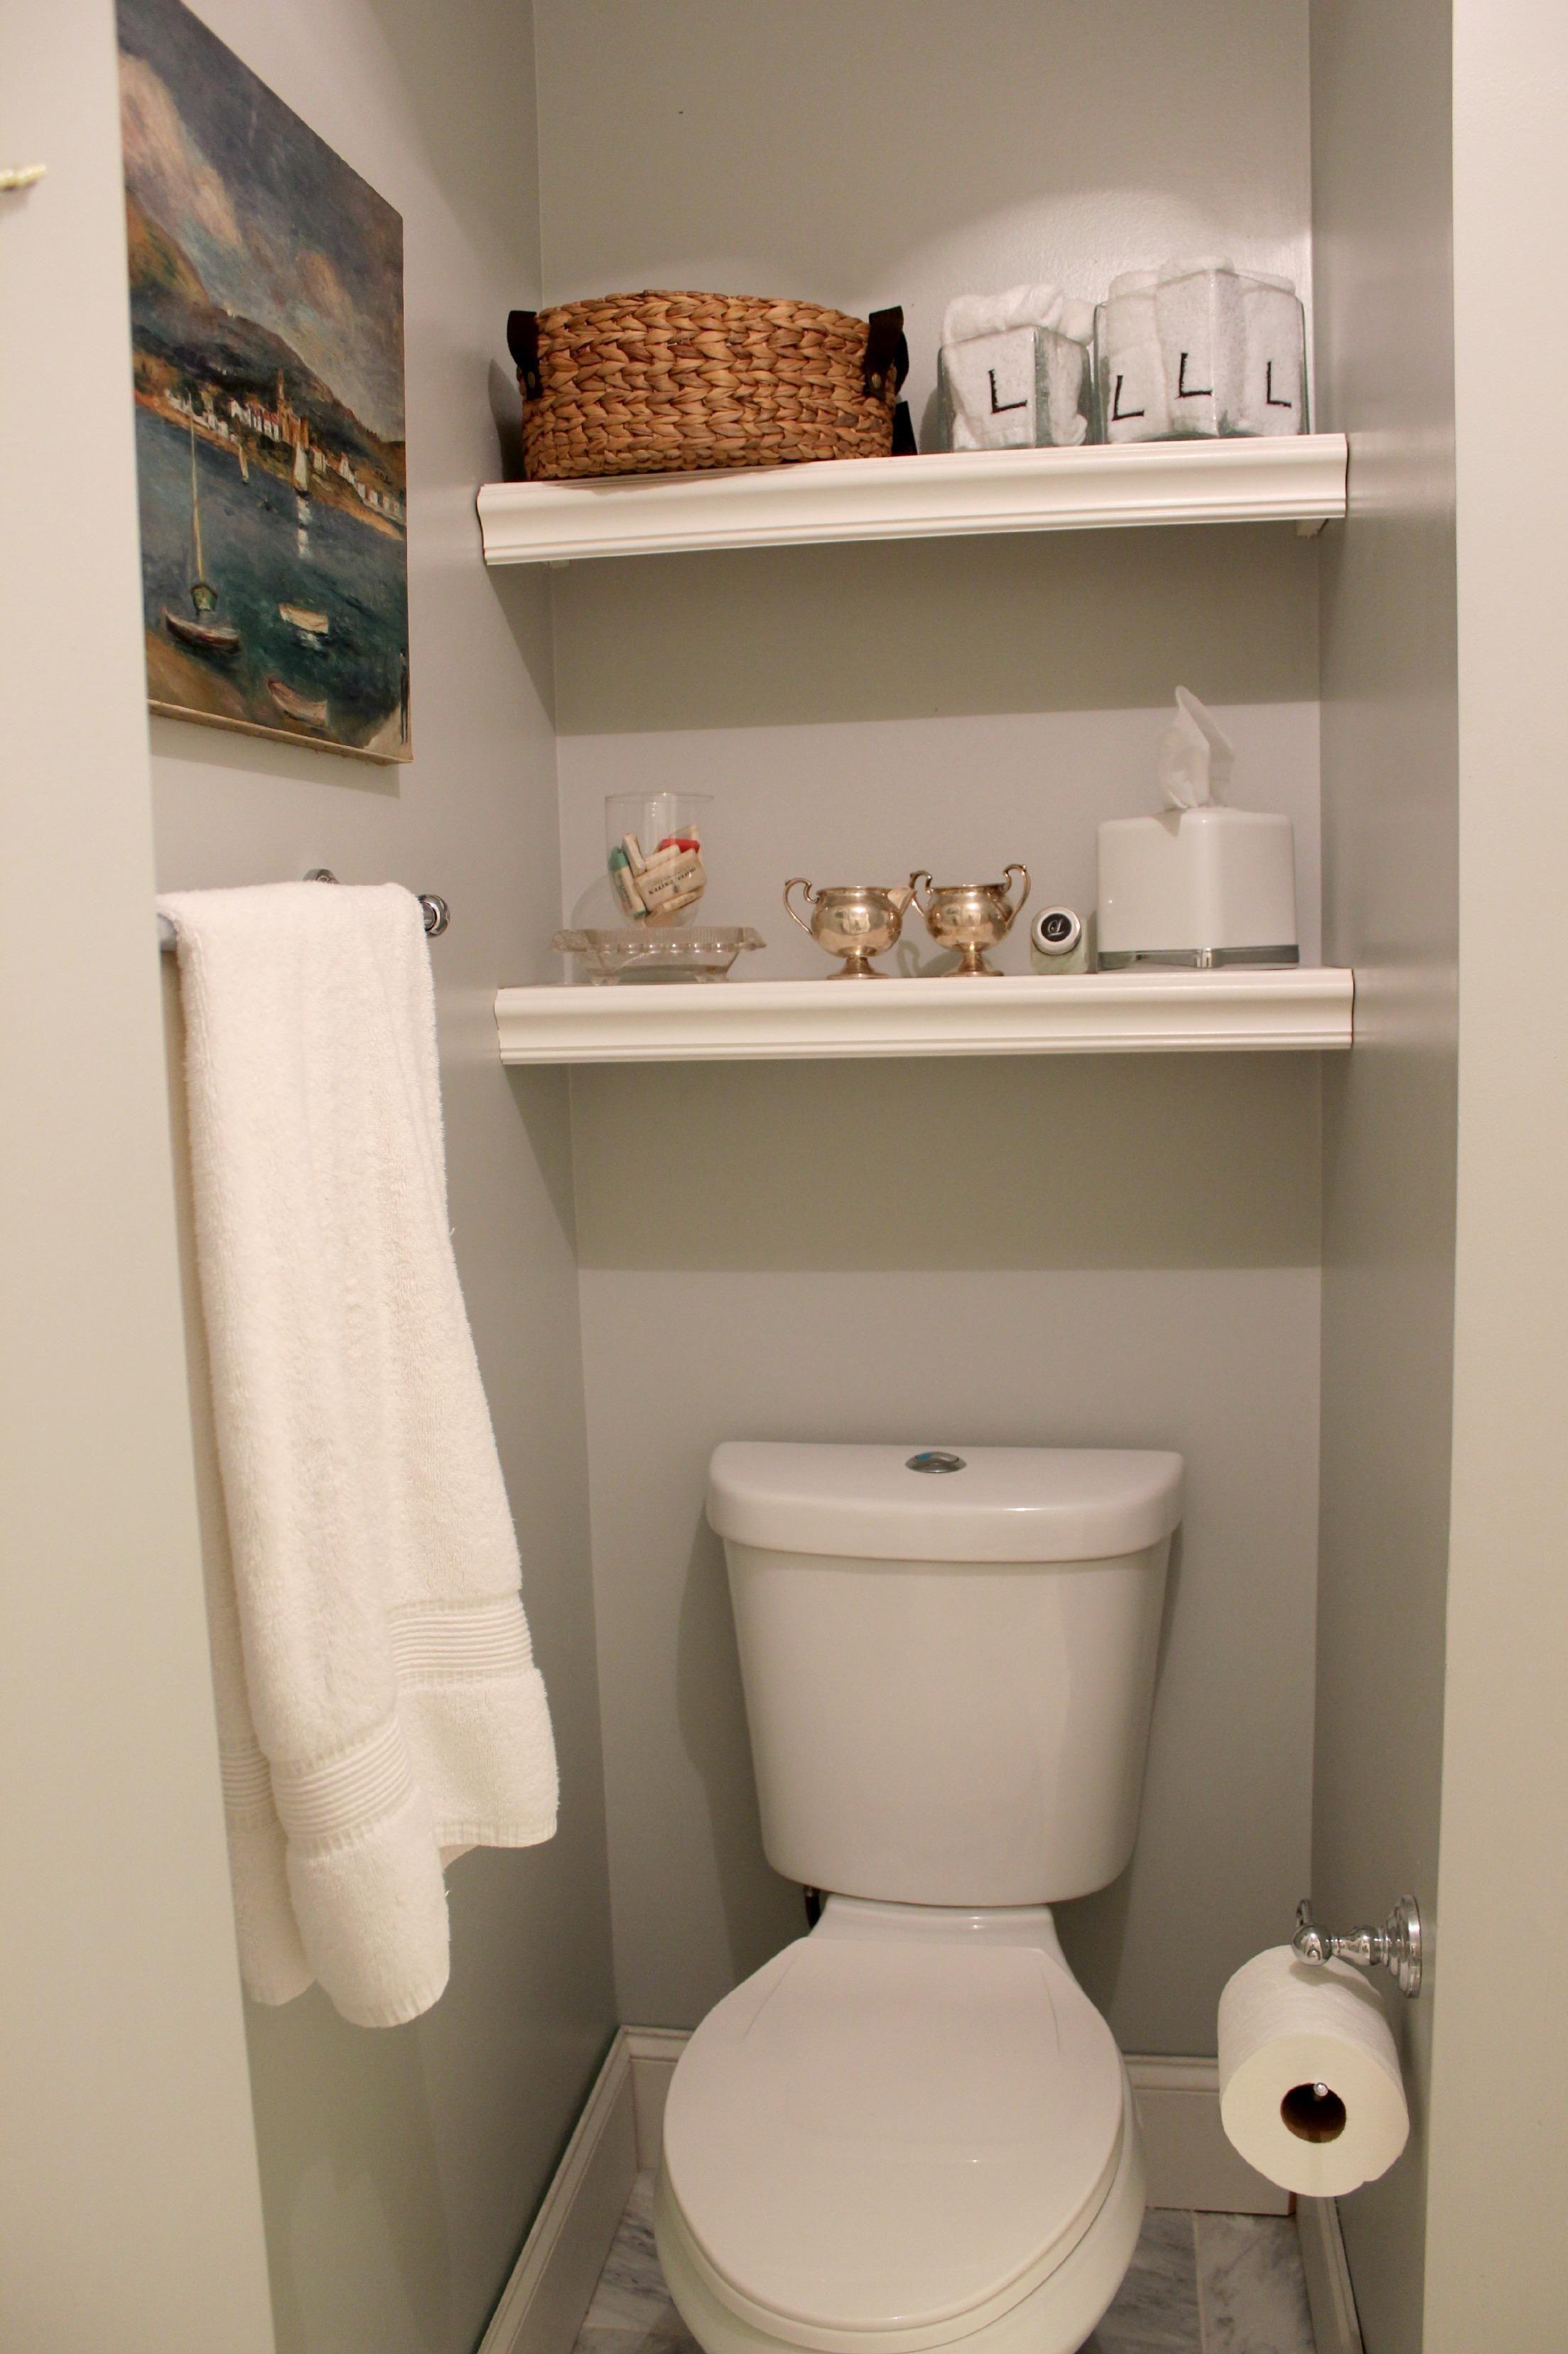 Storage Solutions For Bathrooms Polliwogs Pond Storage Solutions For Small Spaces That Adds Space Quir Over Toilet Storage Gray Bathroom Decor Bathroom Shelves